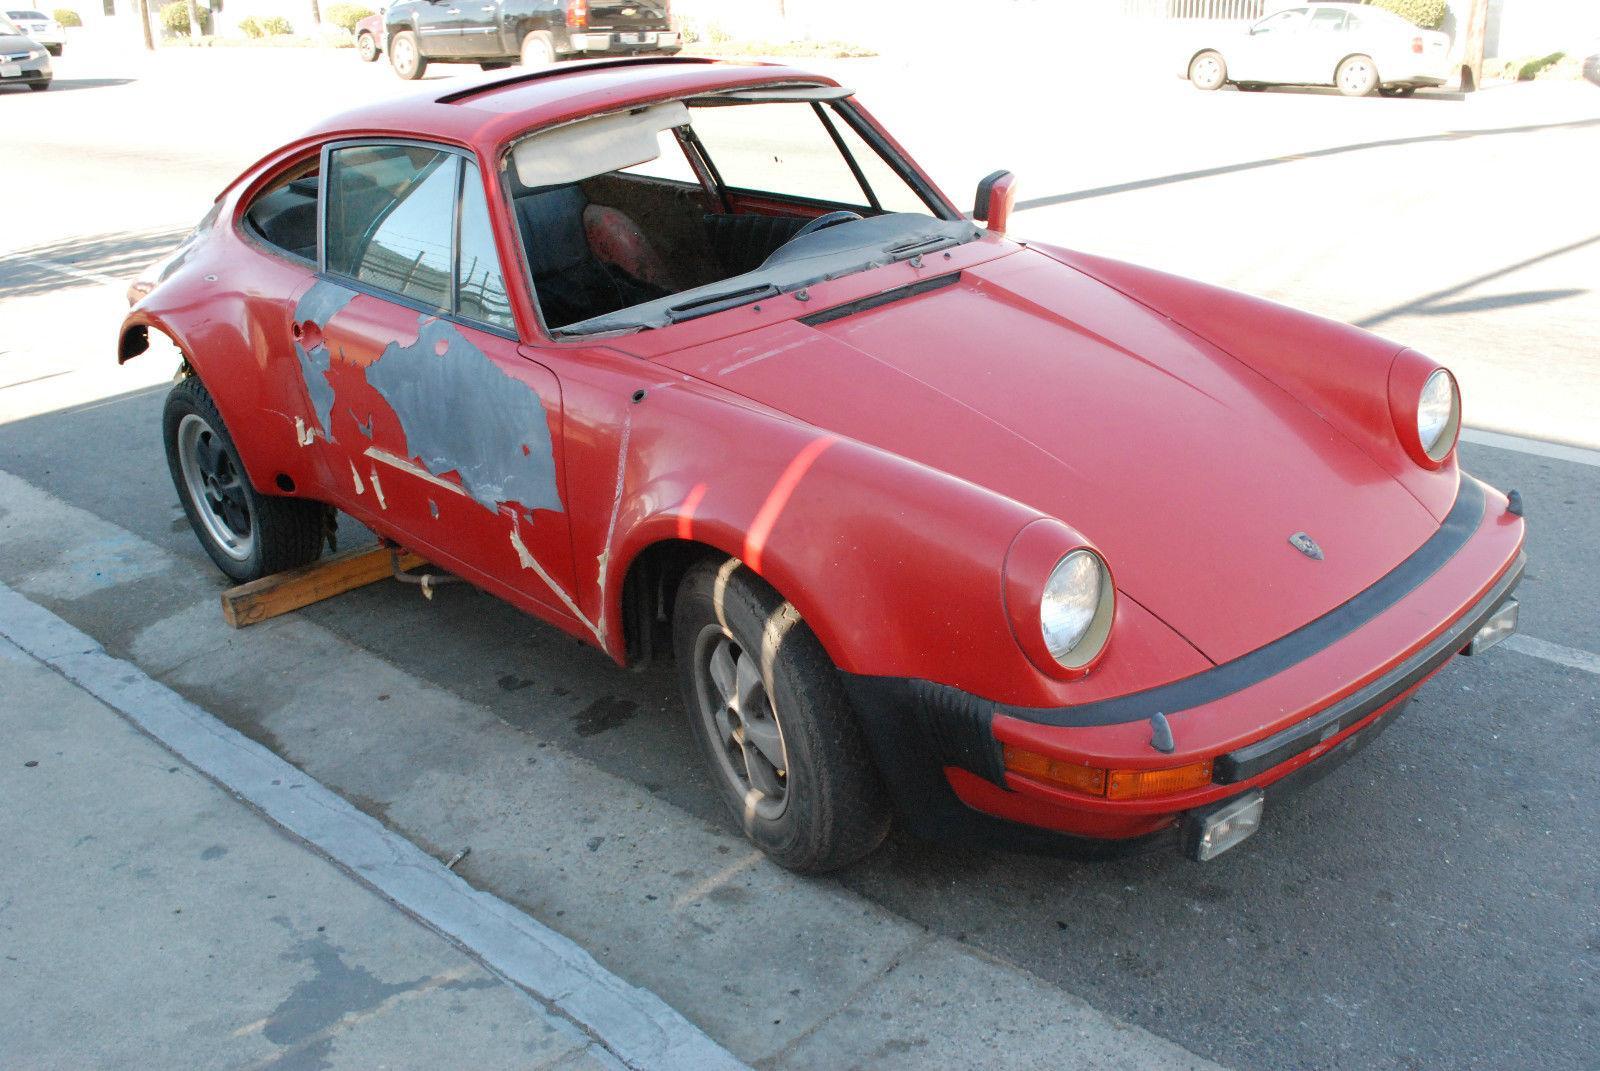 Auto For Sale For Sale: 1976 Porsche 911 930 For Sale